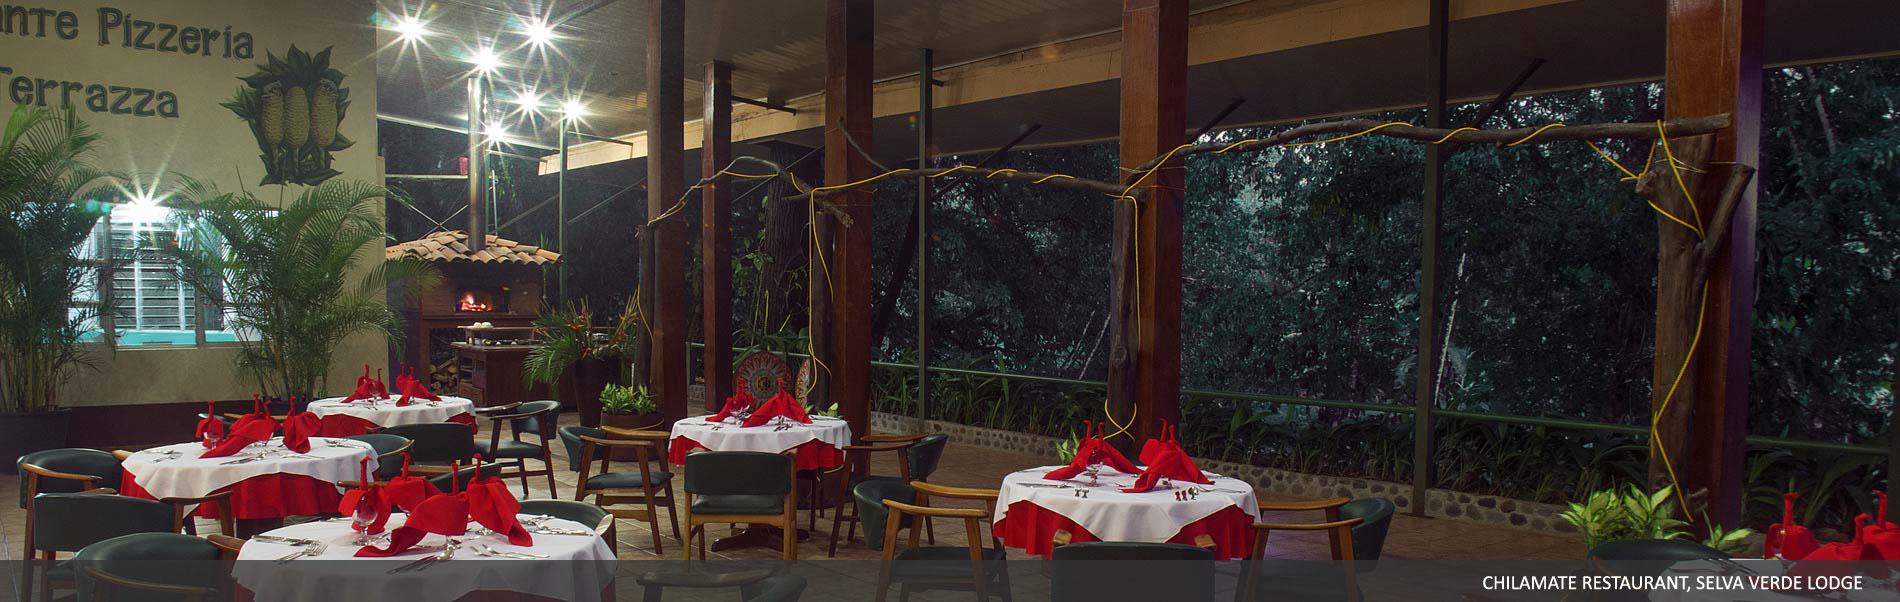 restaurante-chilamate.jpg